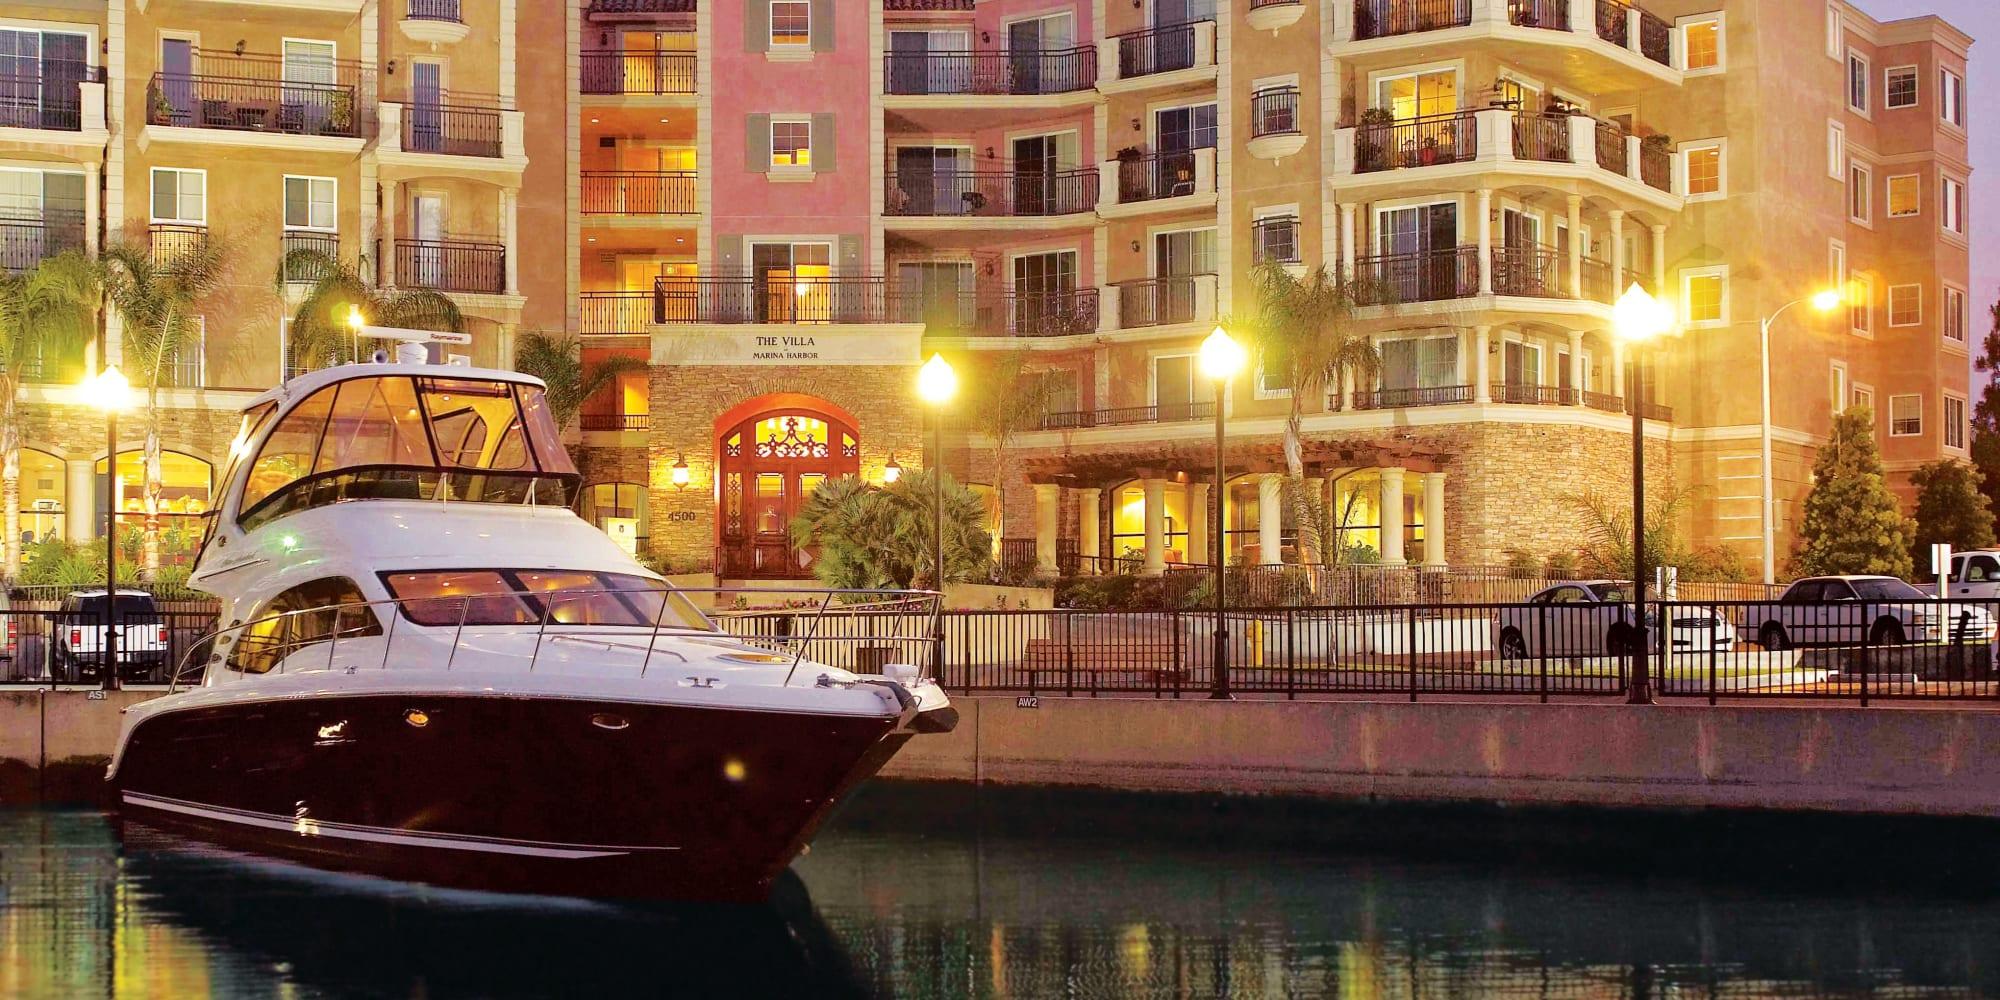 Boat docked in the evening outside at The Villa at Marina Harbor in Marina del Rey, California